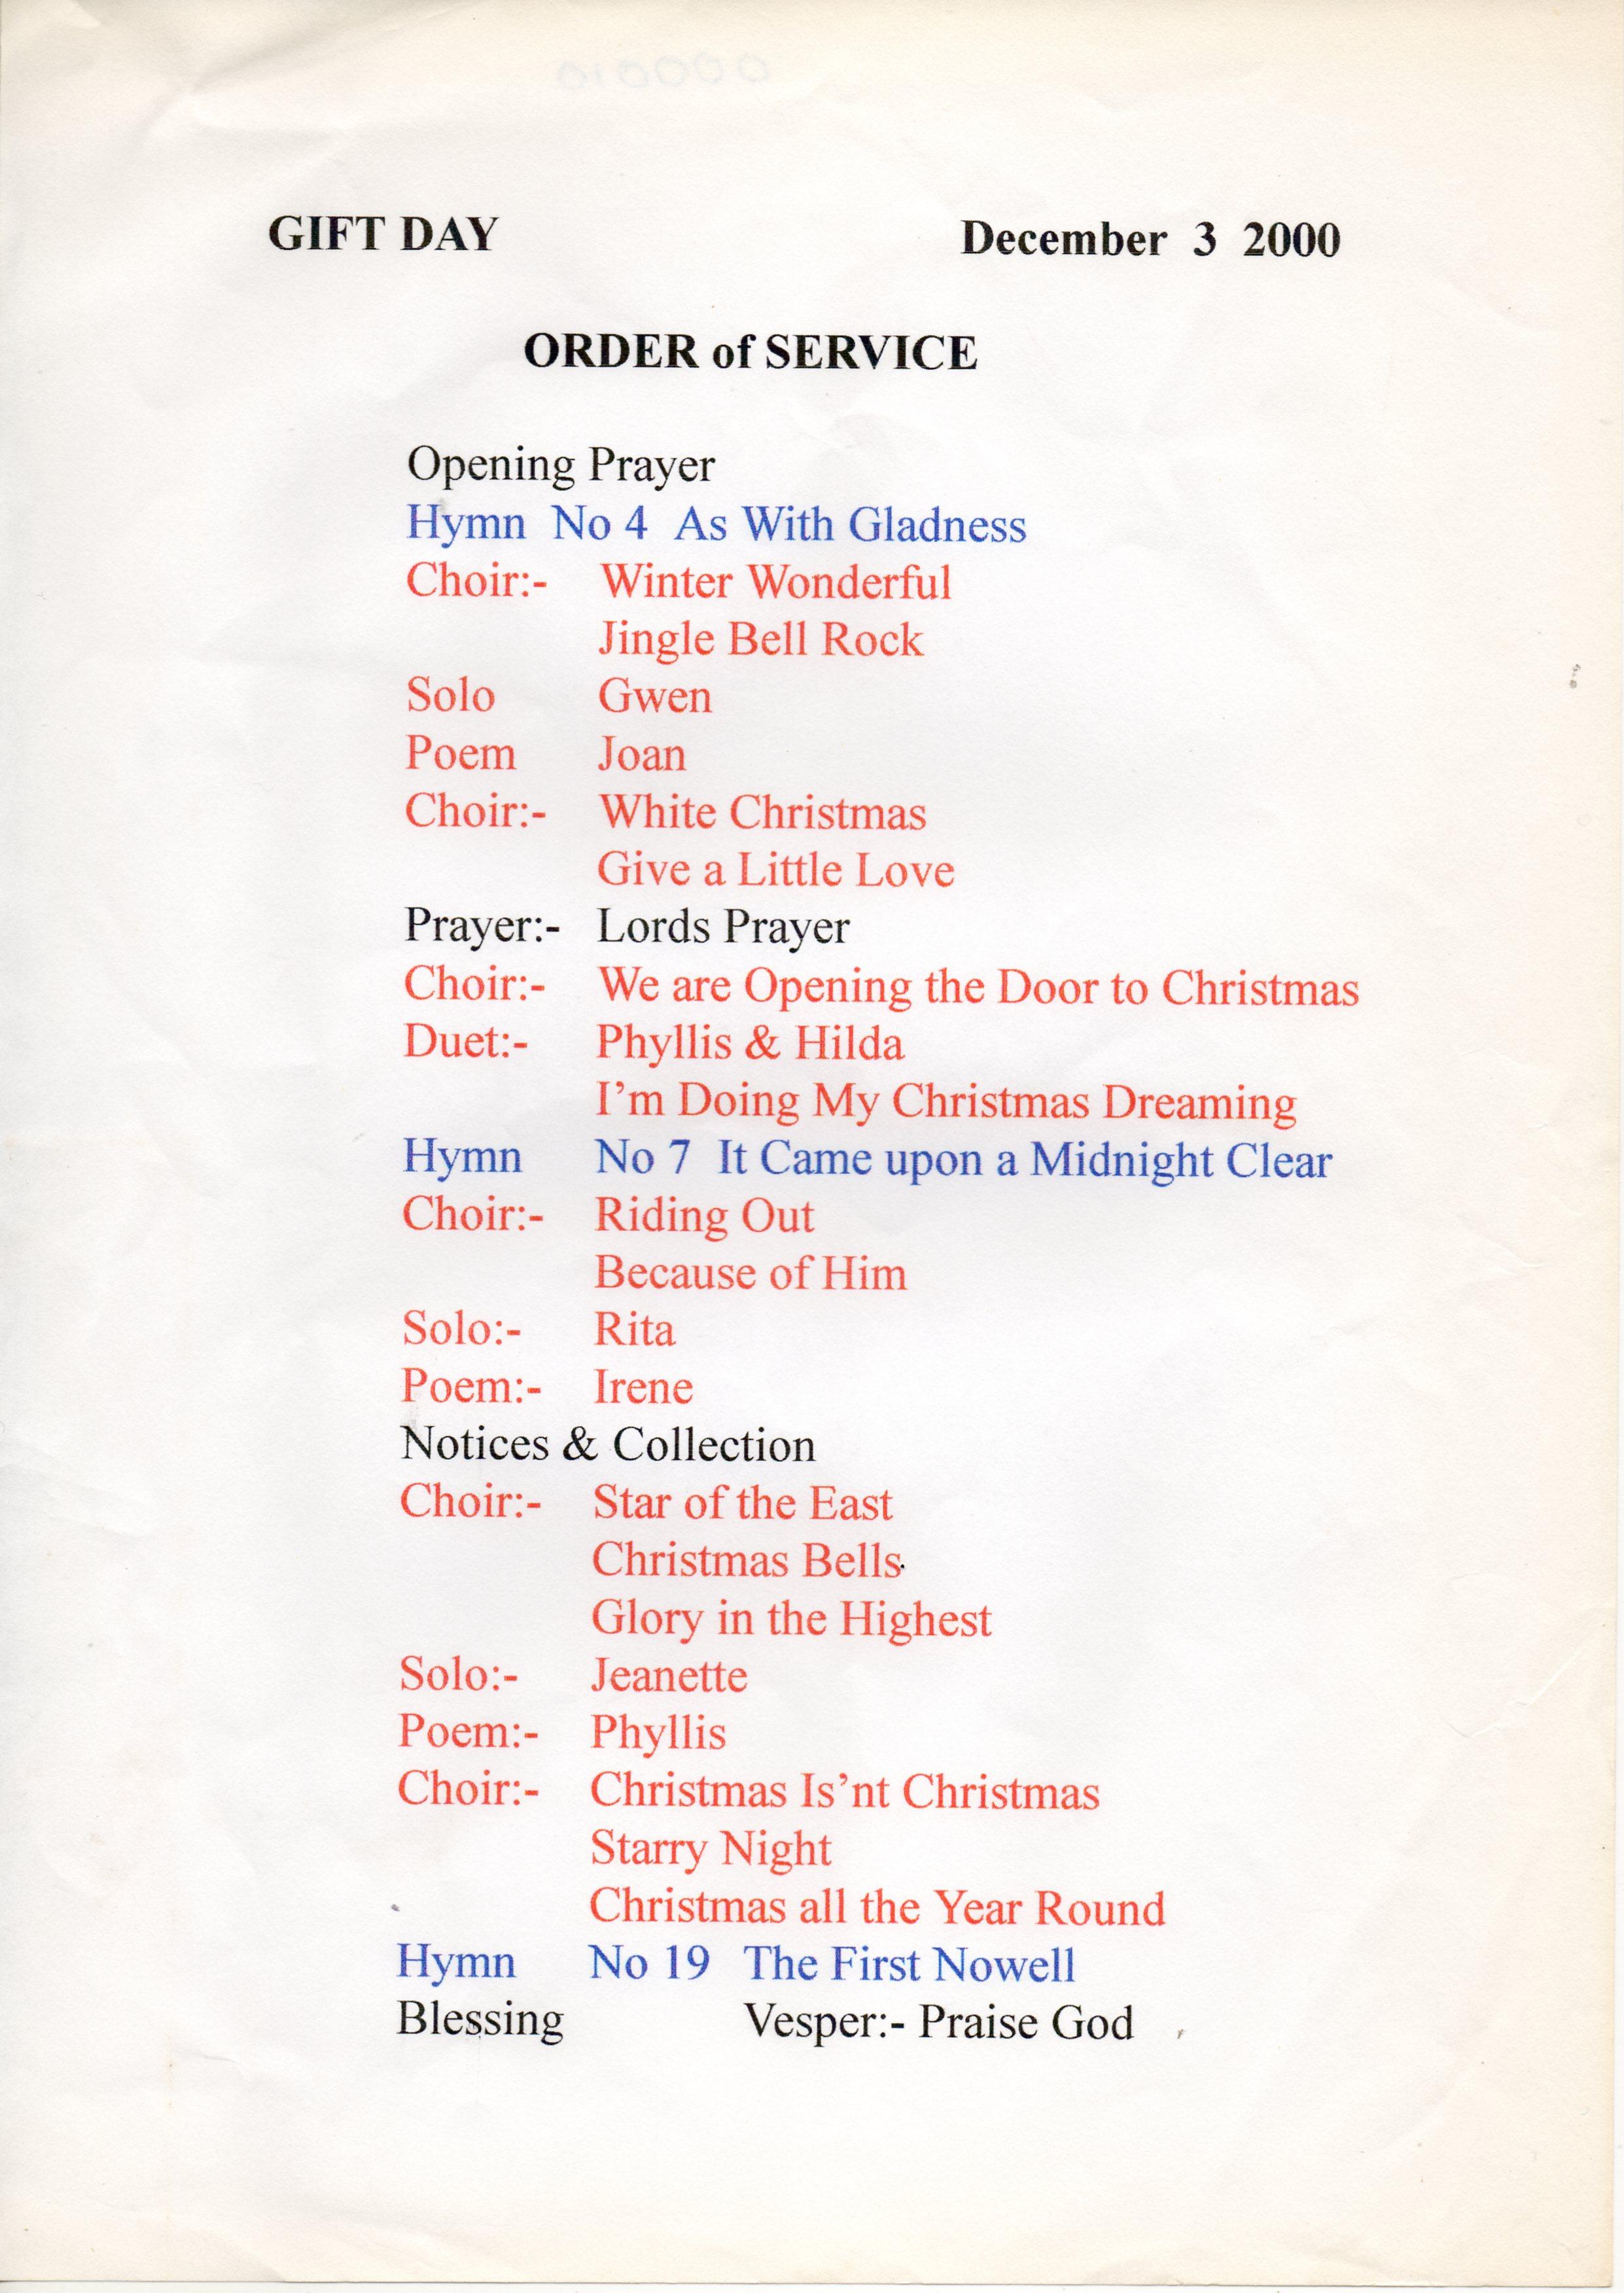 J035_Gift-Day_Service-[Dec-2000]